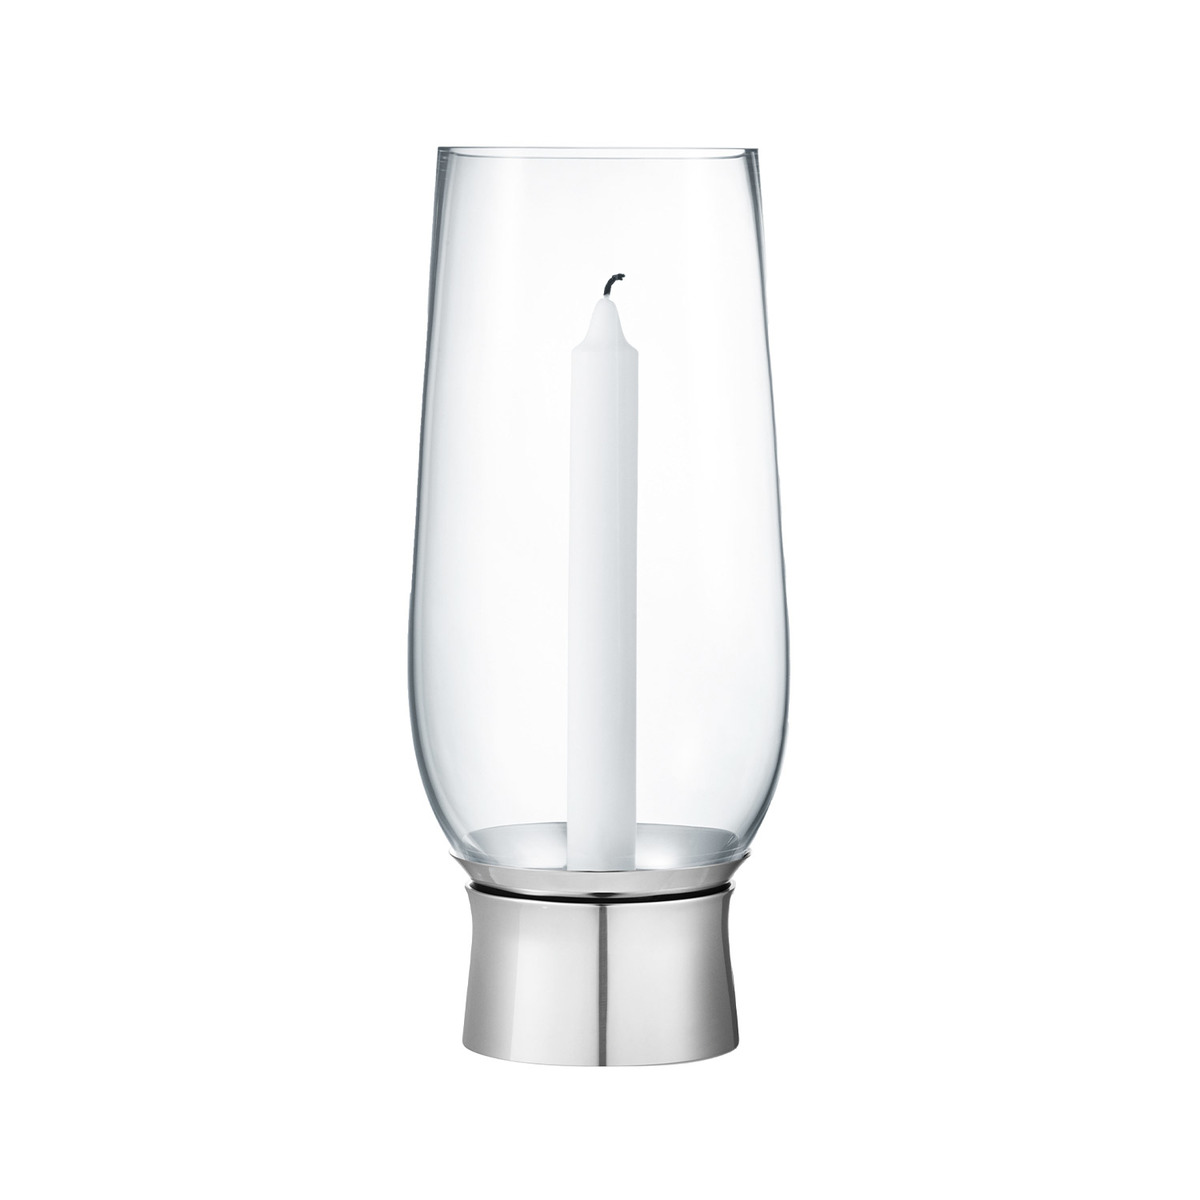 Tealight Holders For Scandinavian Style Finnish Design Shop